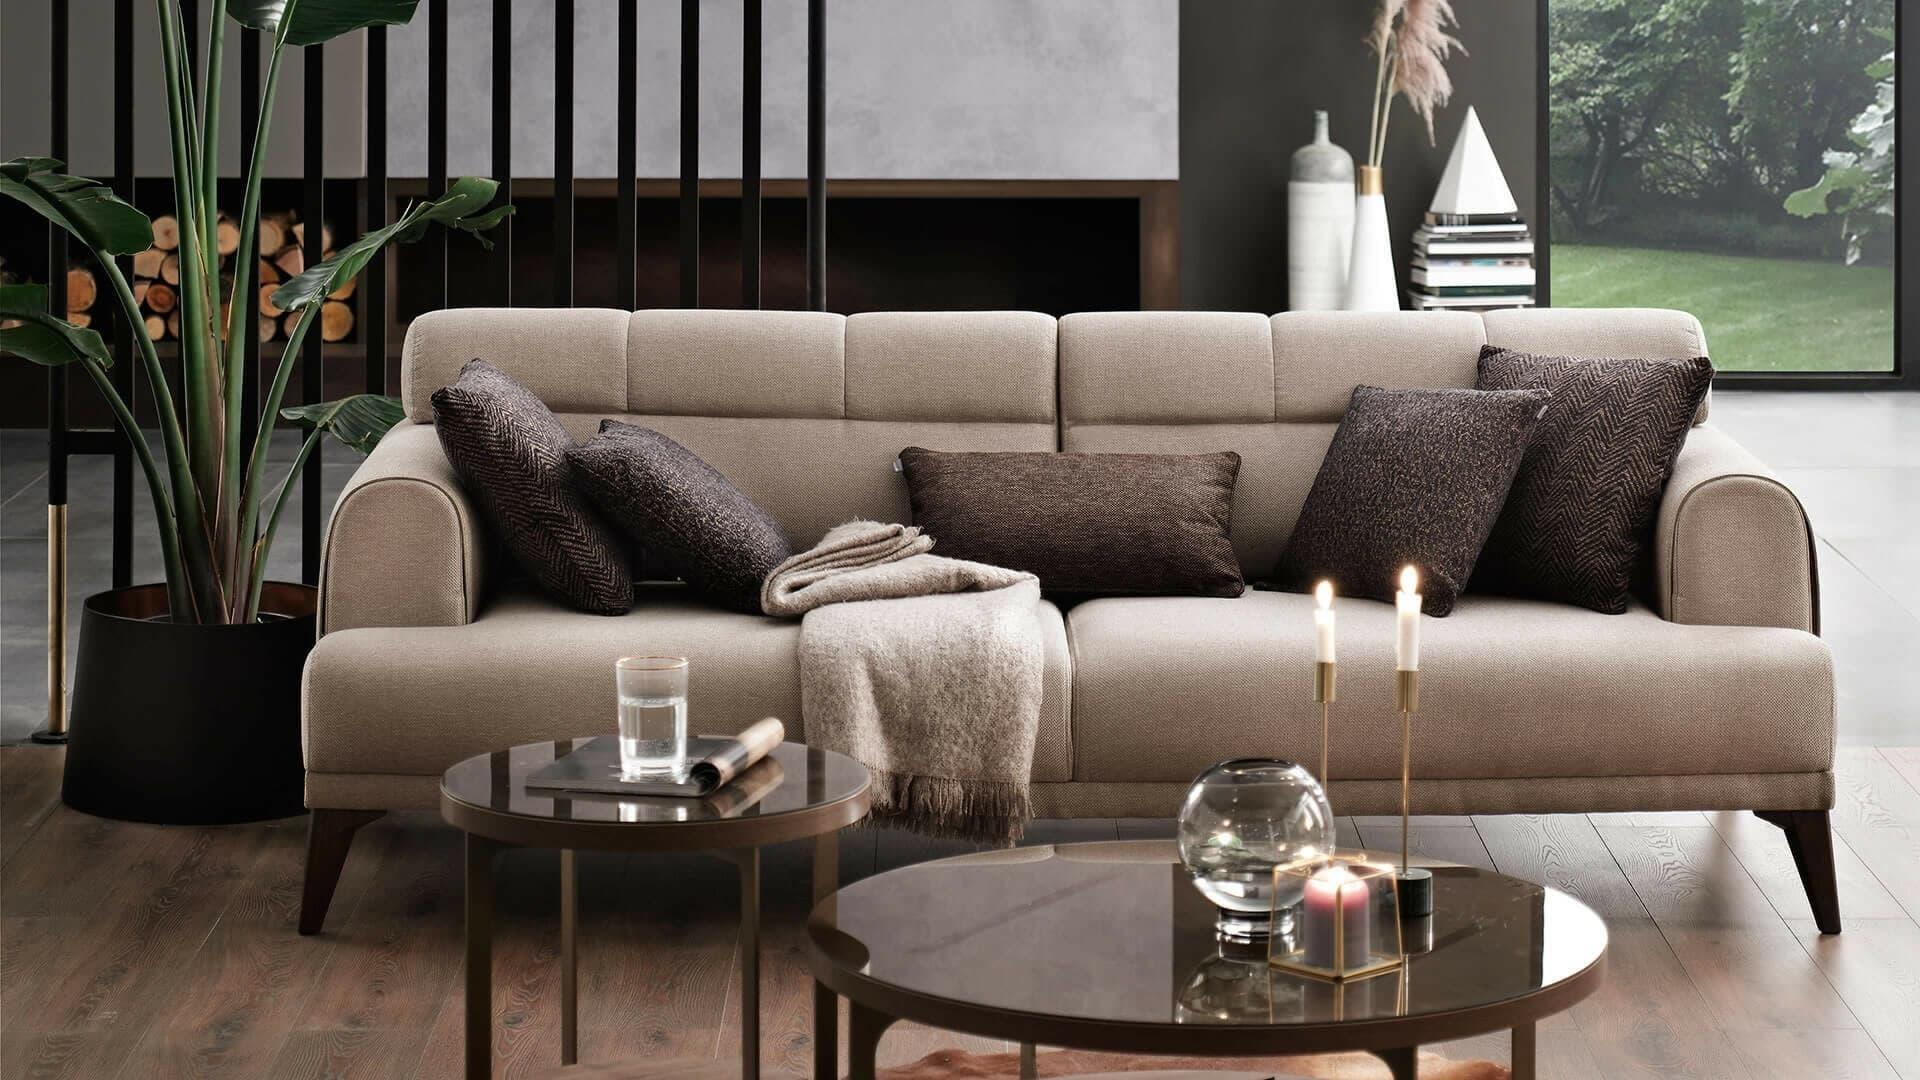 Canapea tapitata cu stofa, 3 locuri, cu functie sleep pentru 1 persoana Madrid Bej, l231xA102xH80 cm poza